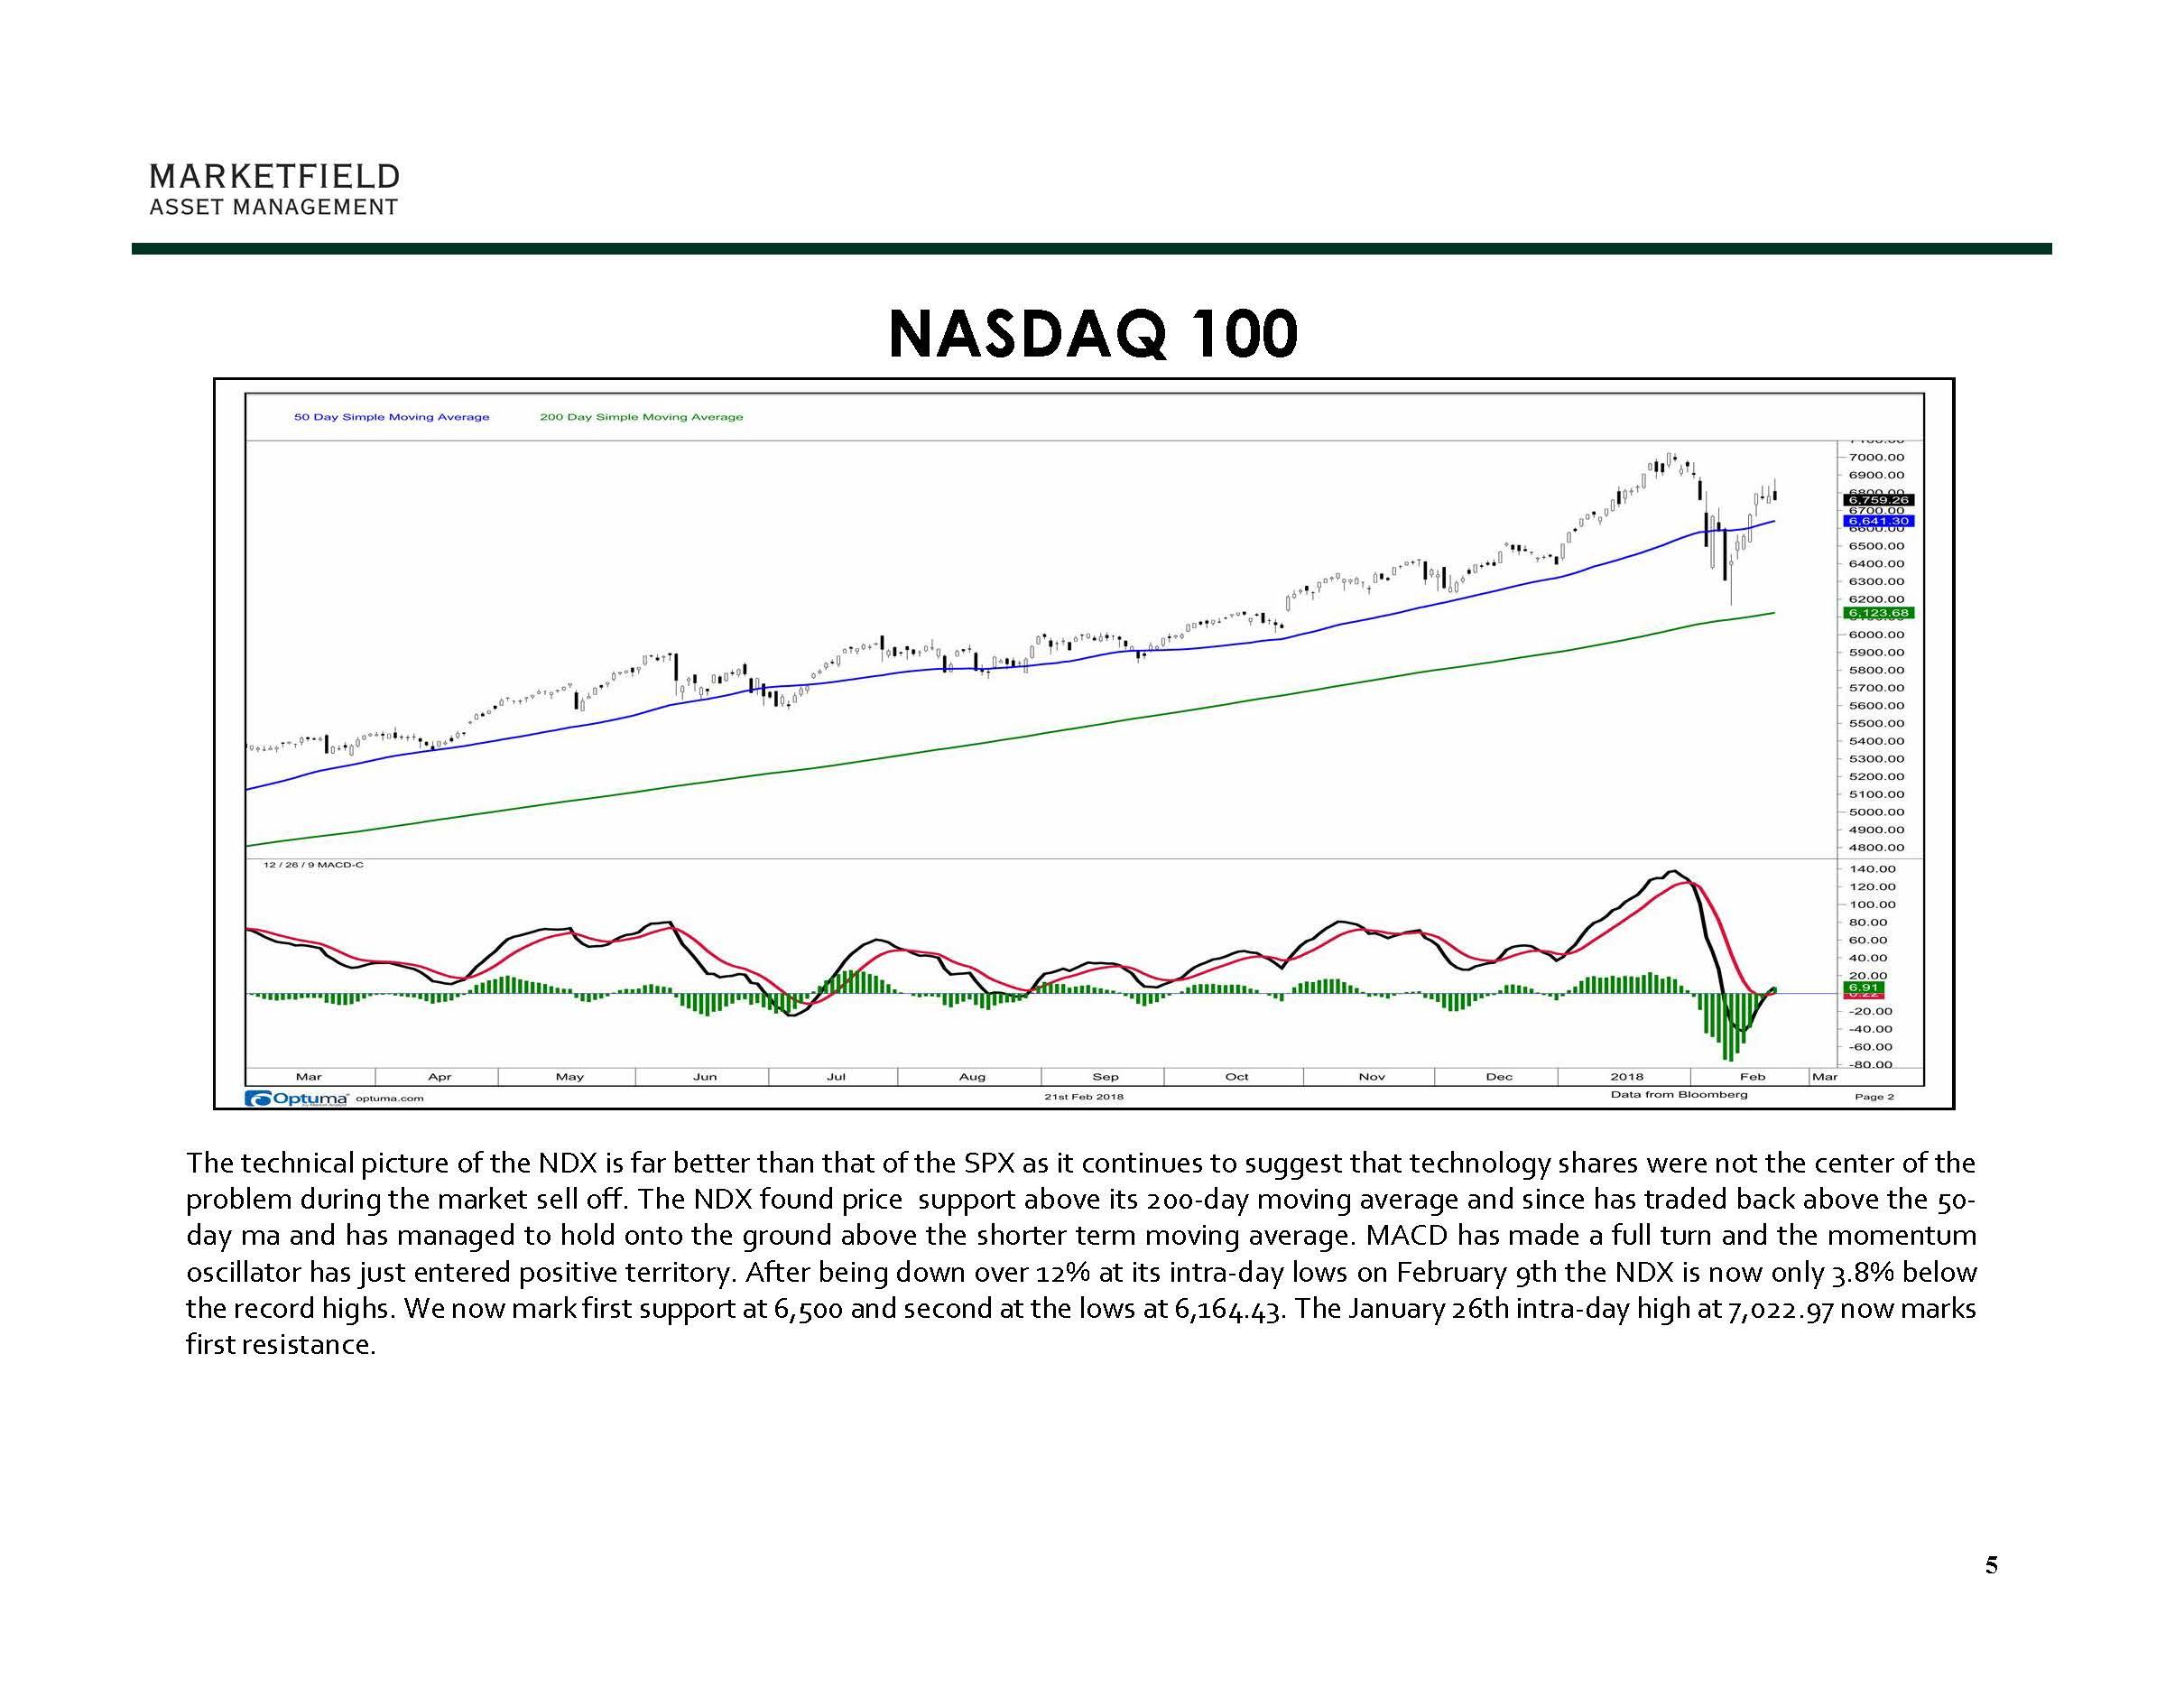 Marketfield Weekly Speculator 02-22-18_Page_05.jpg